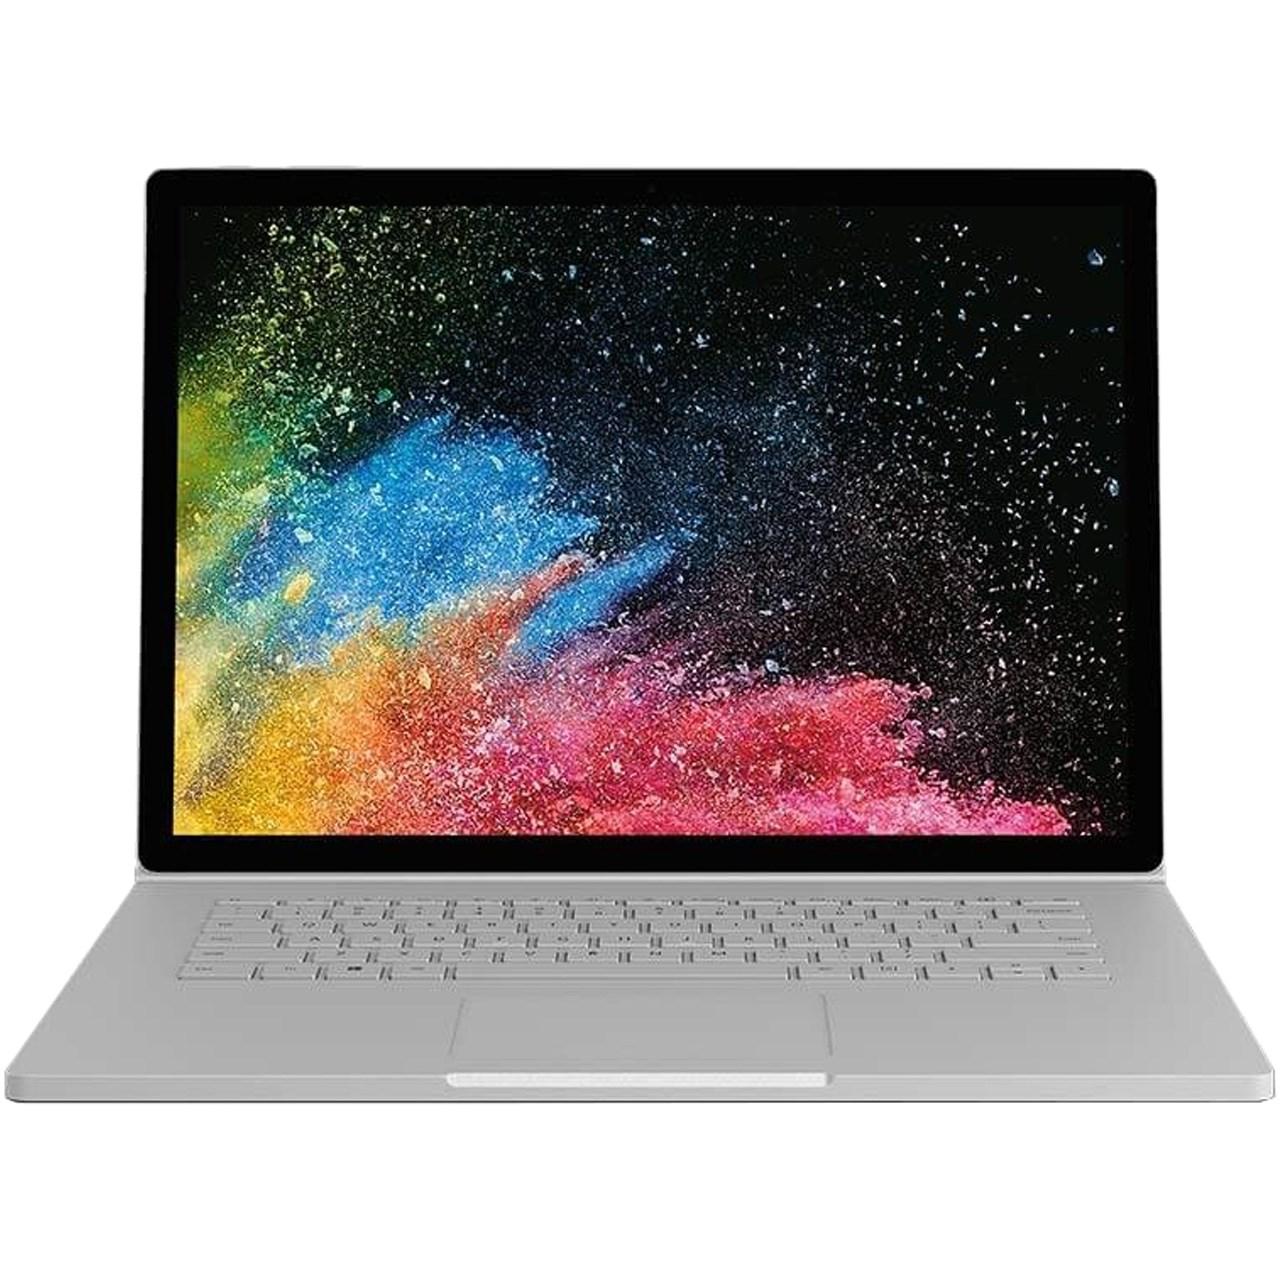 لپ تاپ 15 اینچی مایکروسافت مدل Surface Book 2- A | Microsoft Surface Book 2- A - 15 inch Laptop